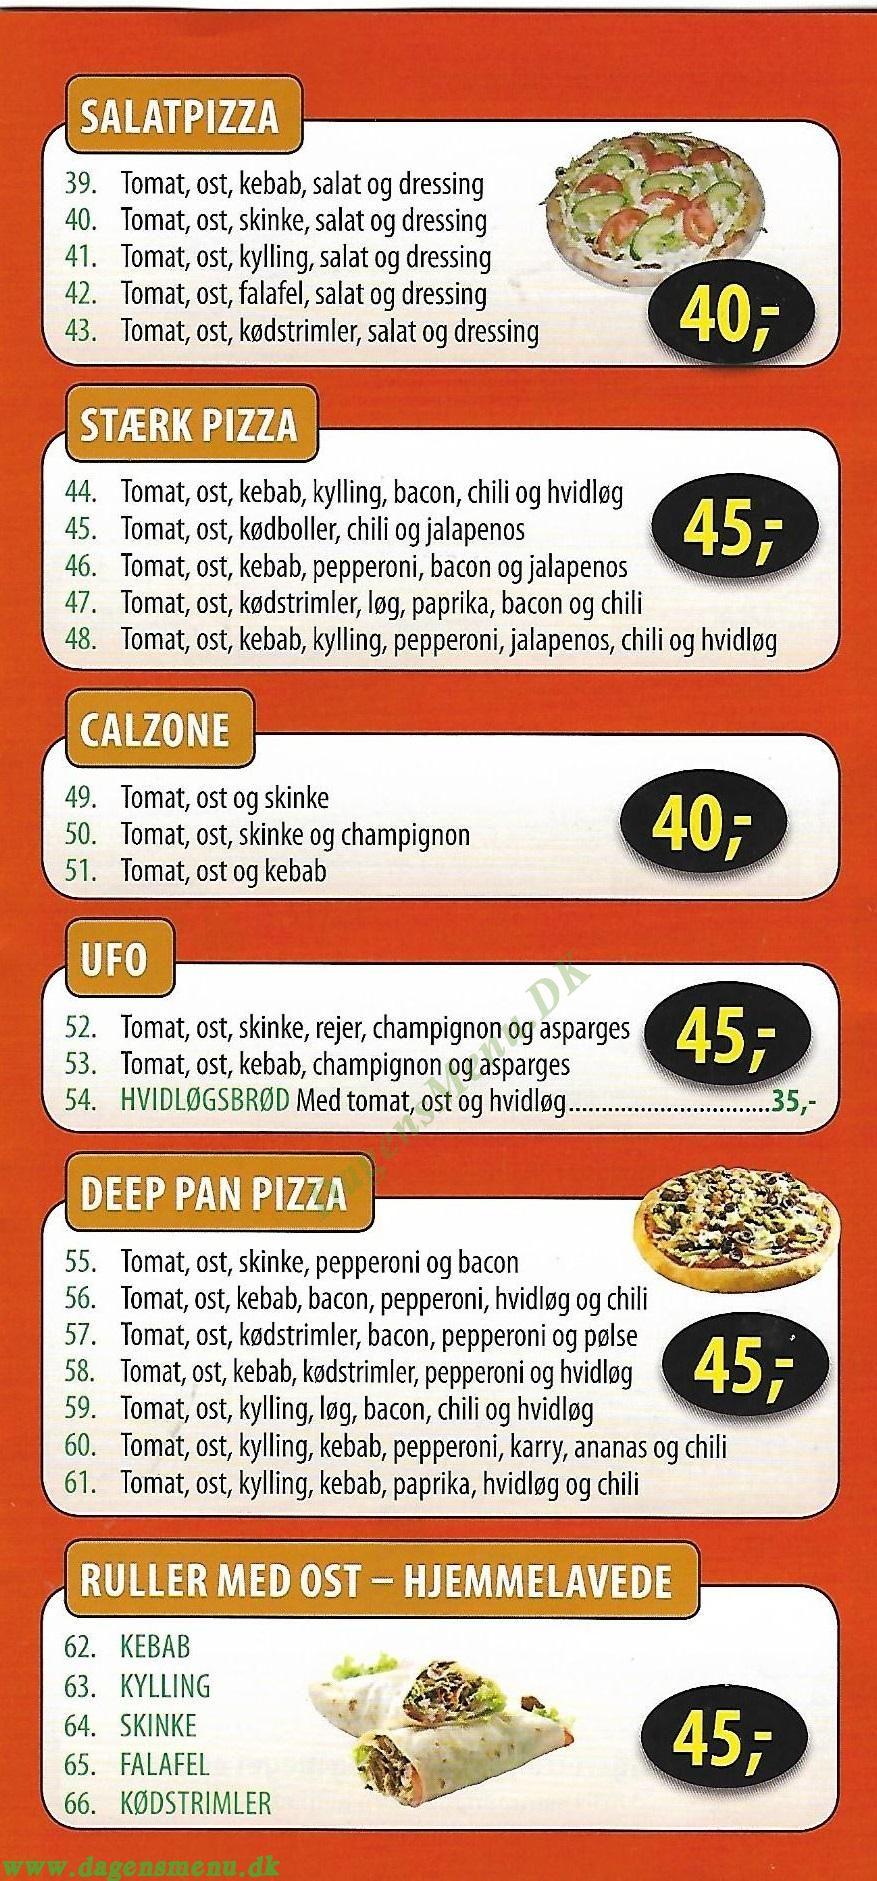 Banekiosken og Pizza - Menukort